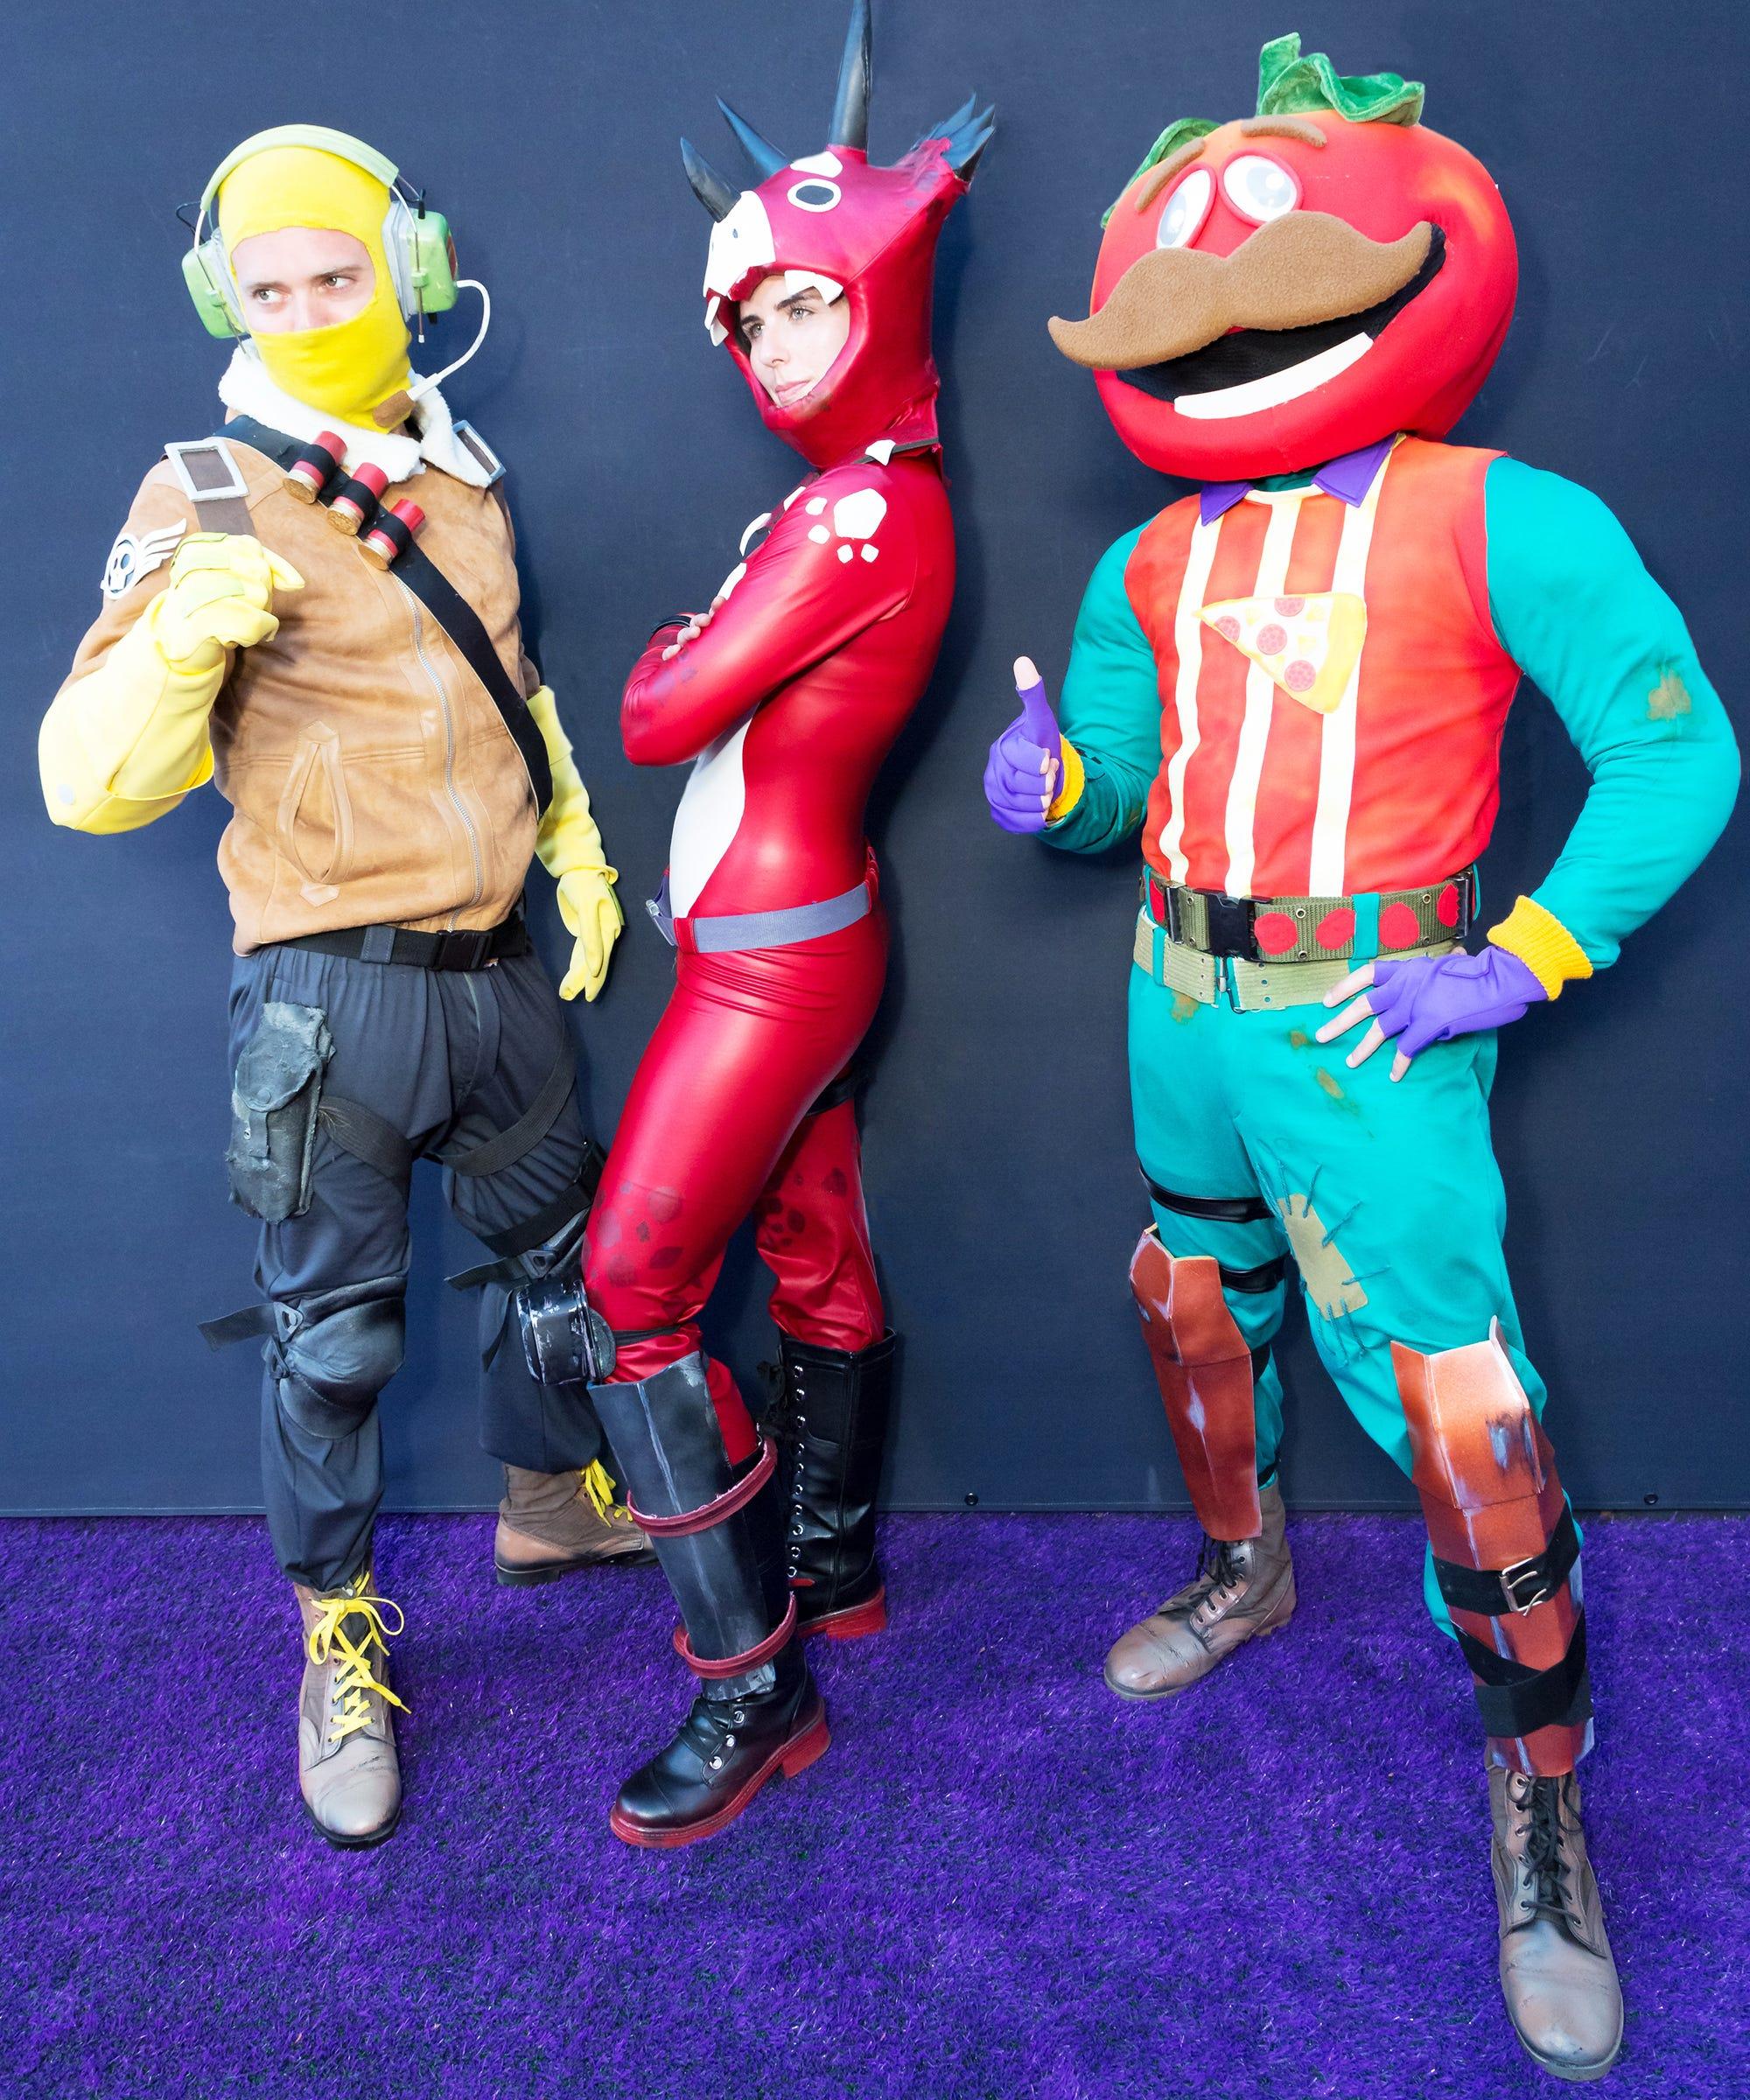 Halloween Fortnite Characters.Fortnite Character Dances To Learn For Halloween